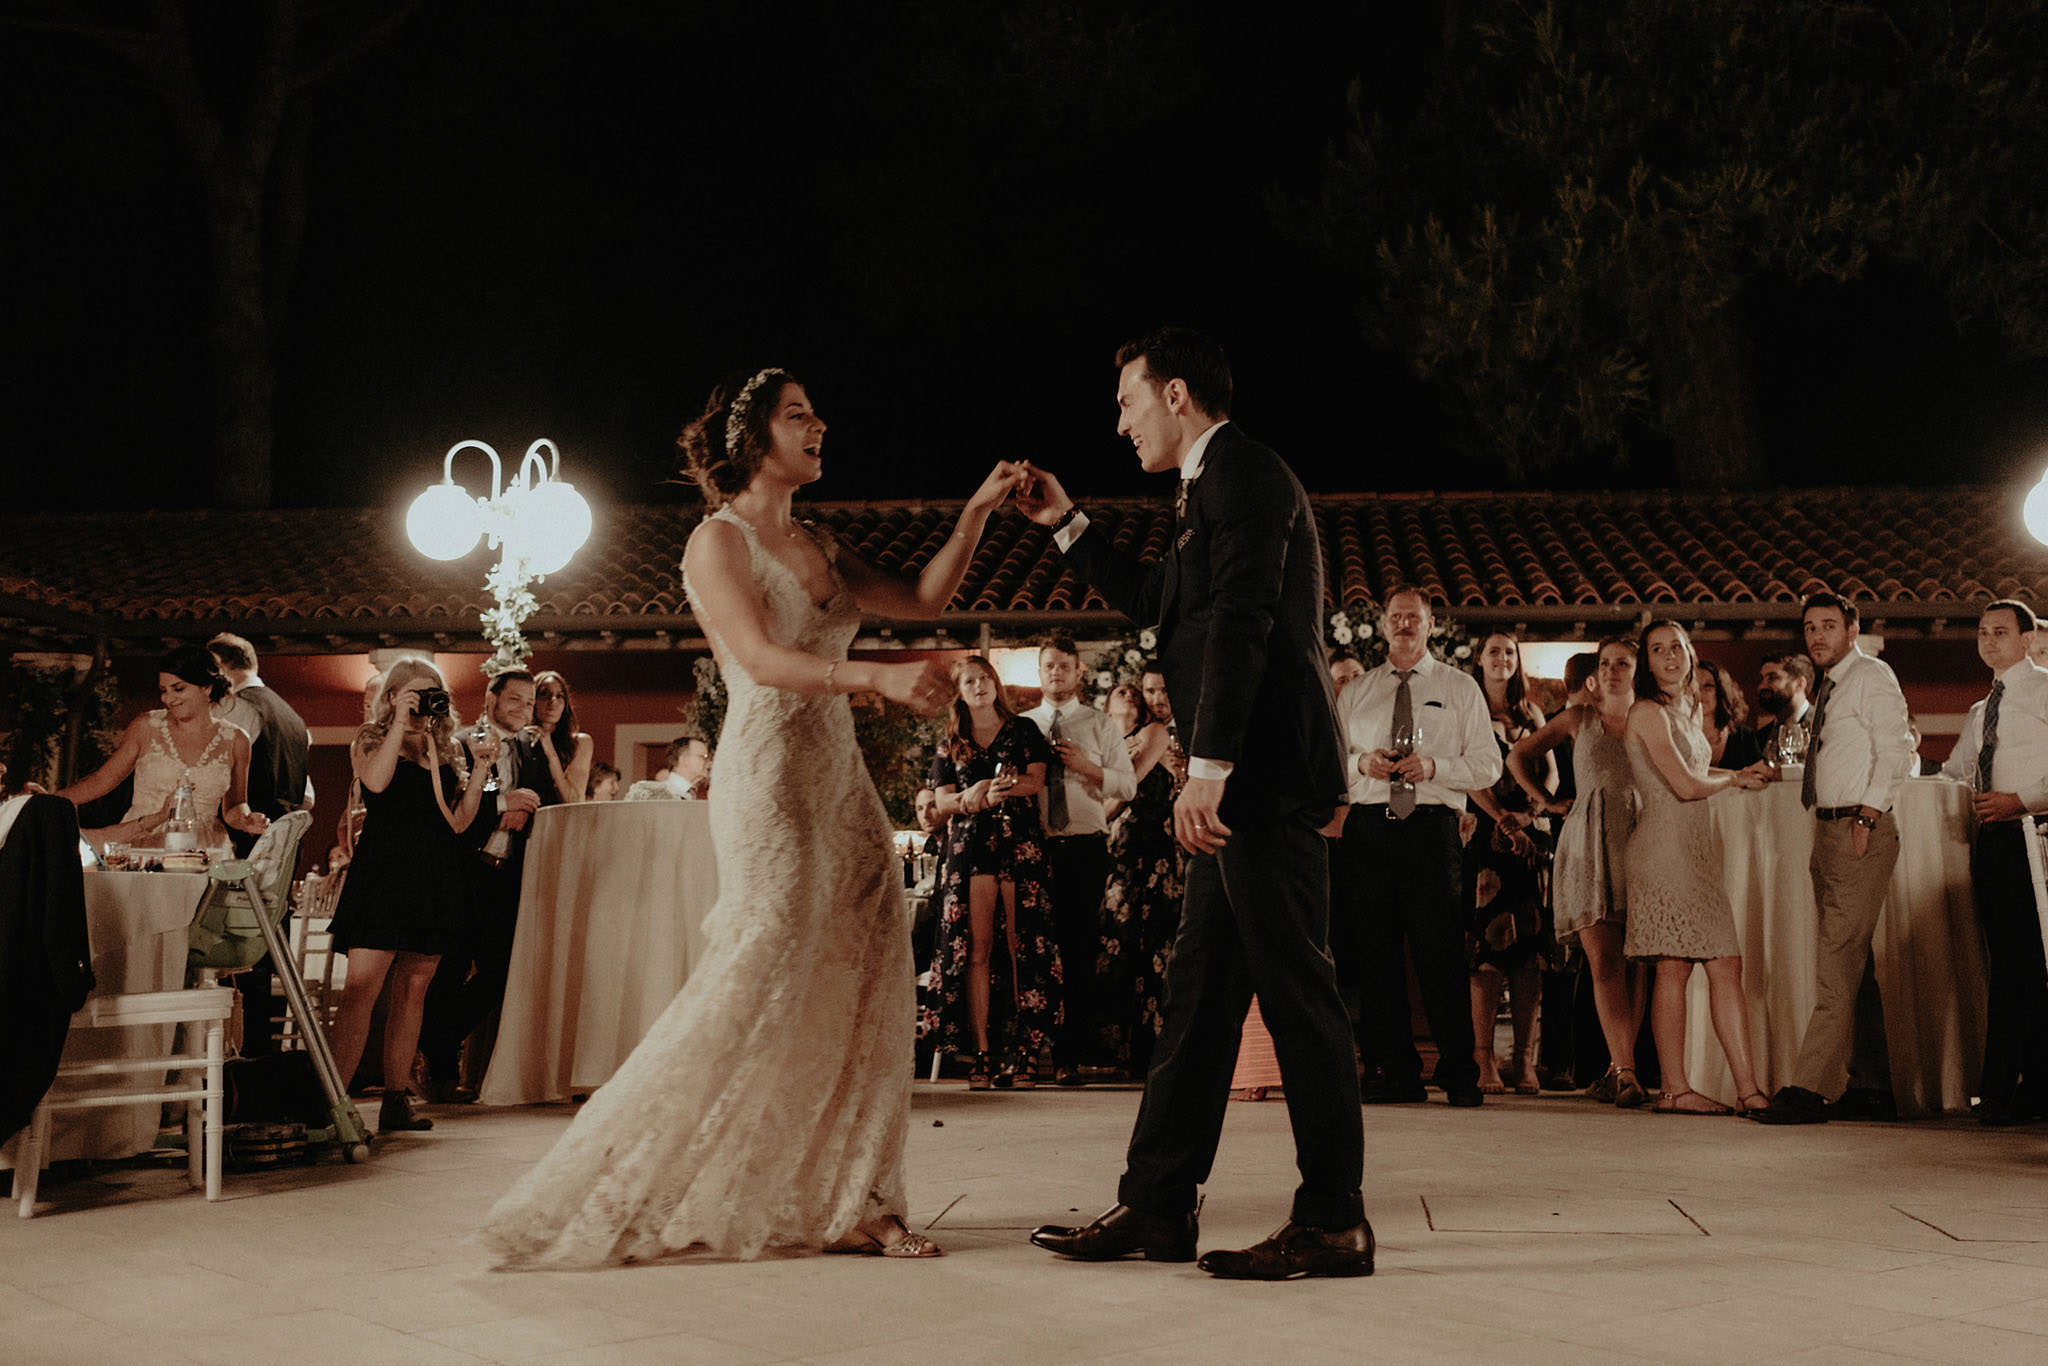 Max-Steph-Italy-Wedding-709.jpg